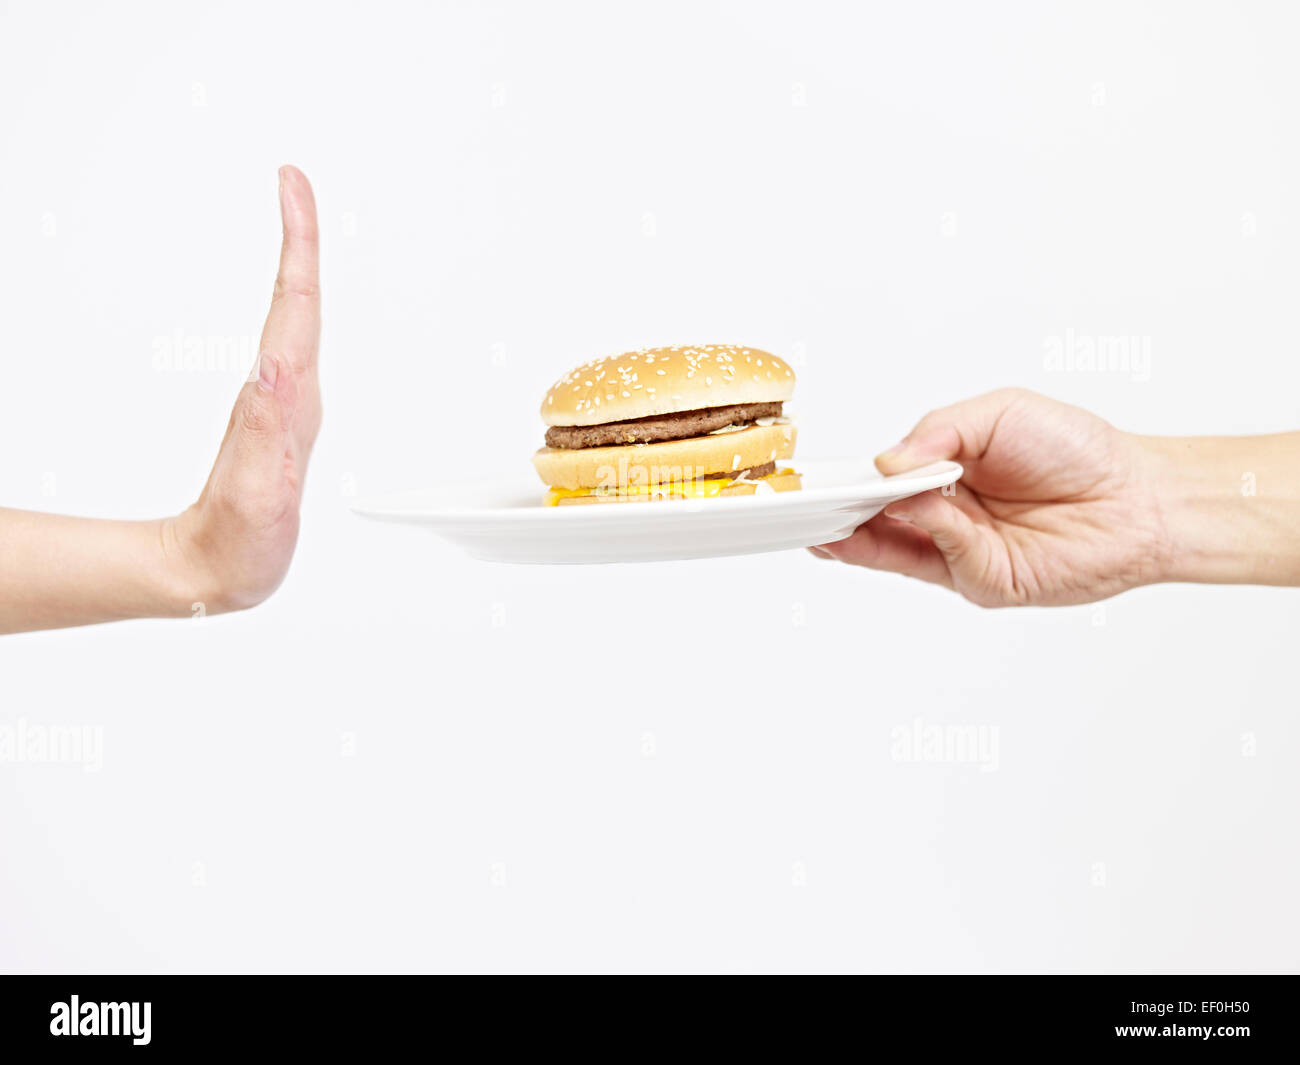 refuse junk food - Stock Image